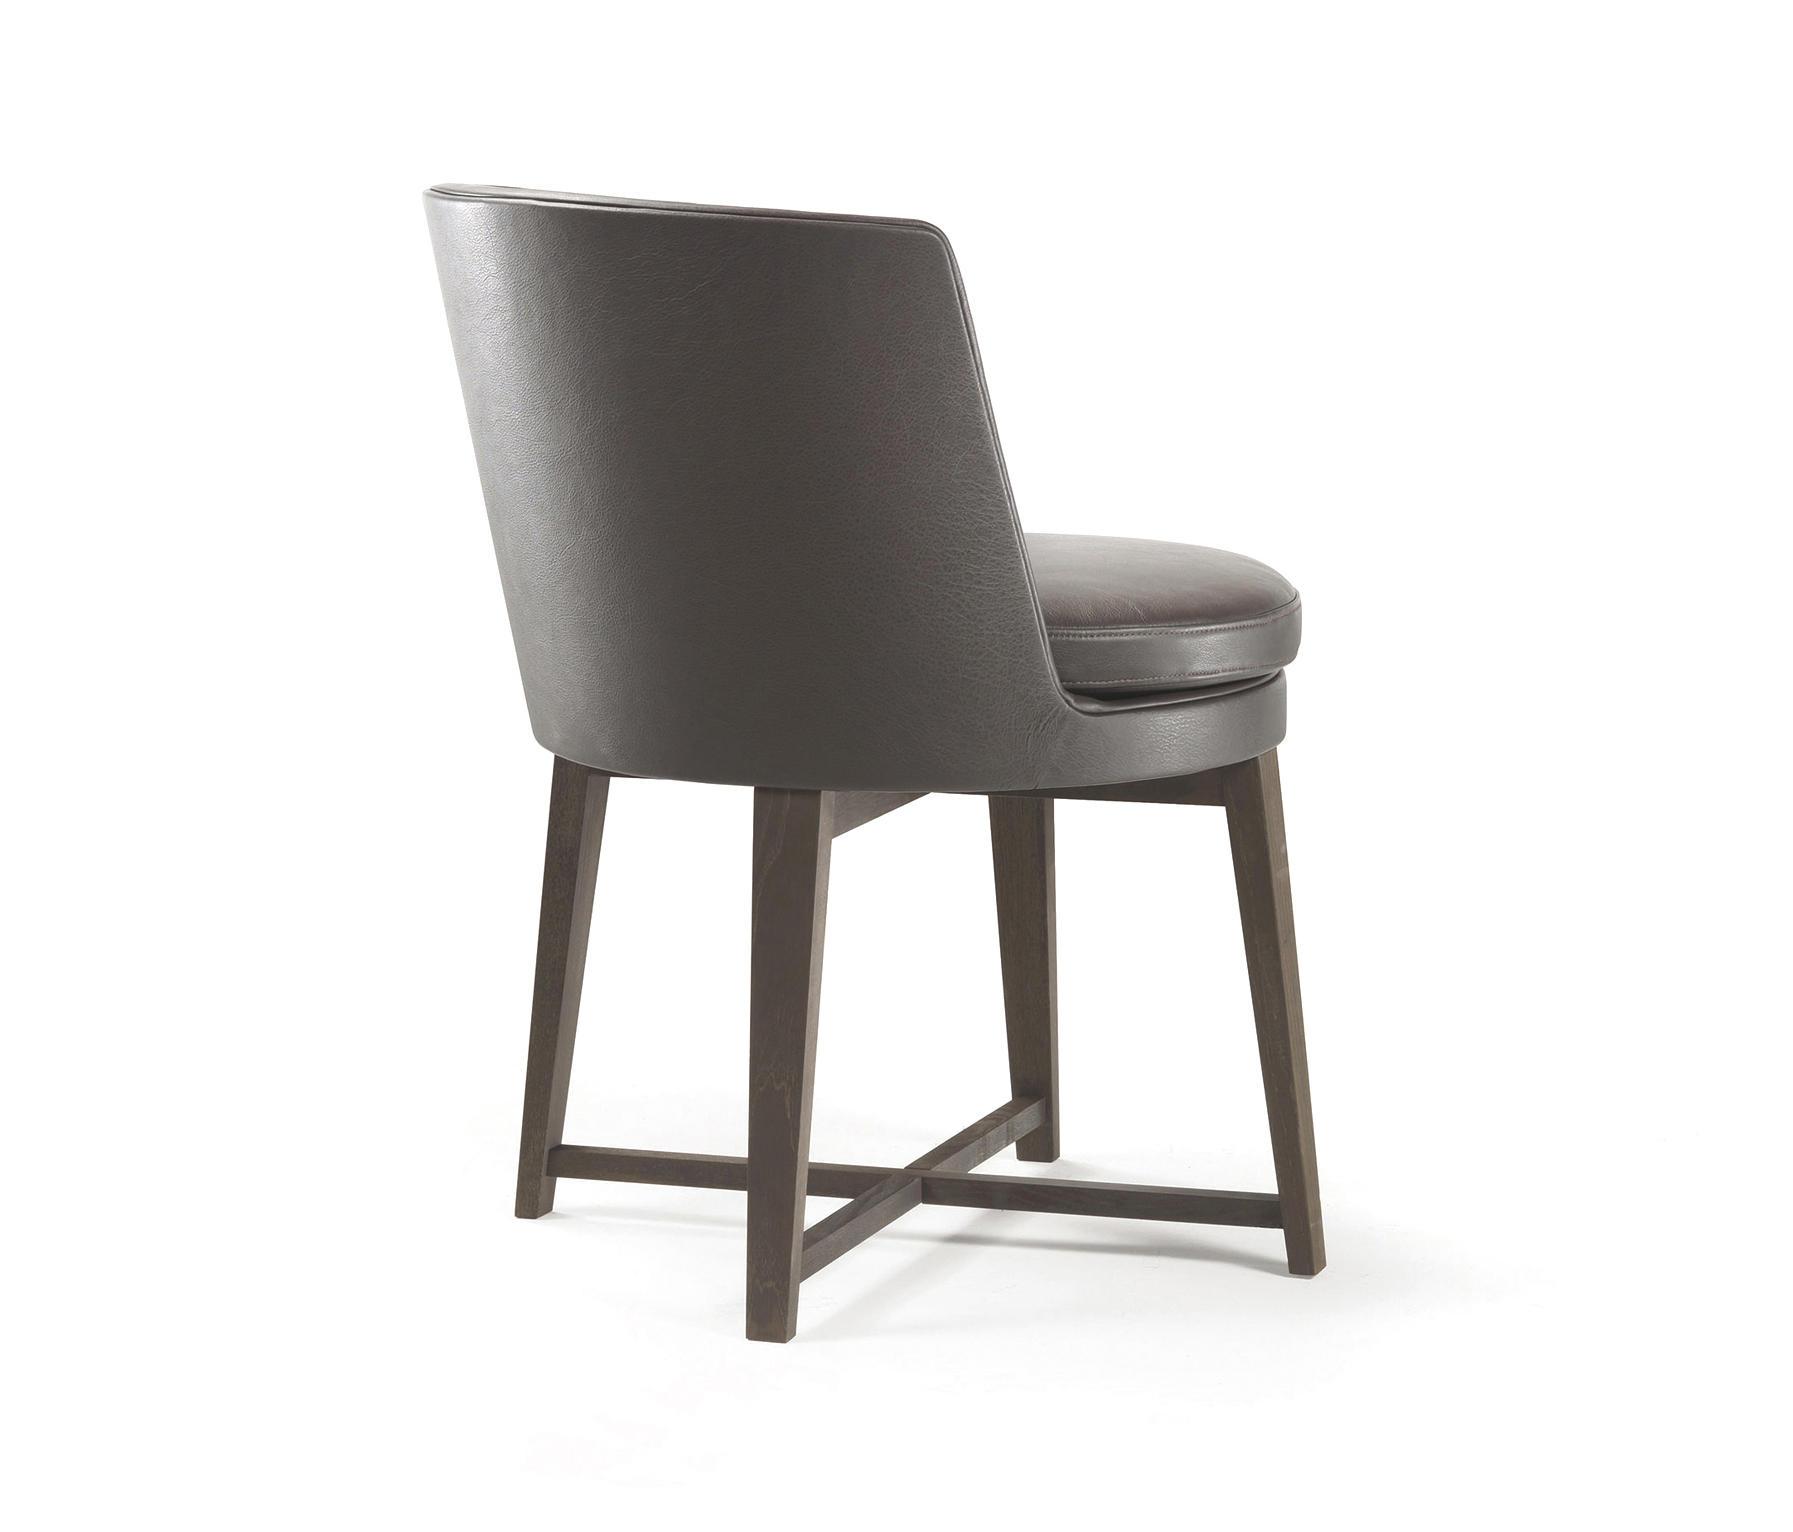 feel good sessel restaurantst hle von flexform architonic. Black Bedroom Furniture Sets. Home Design Ideas